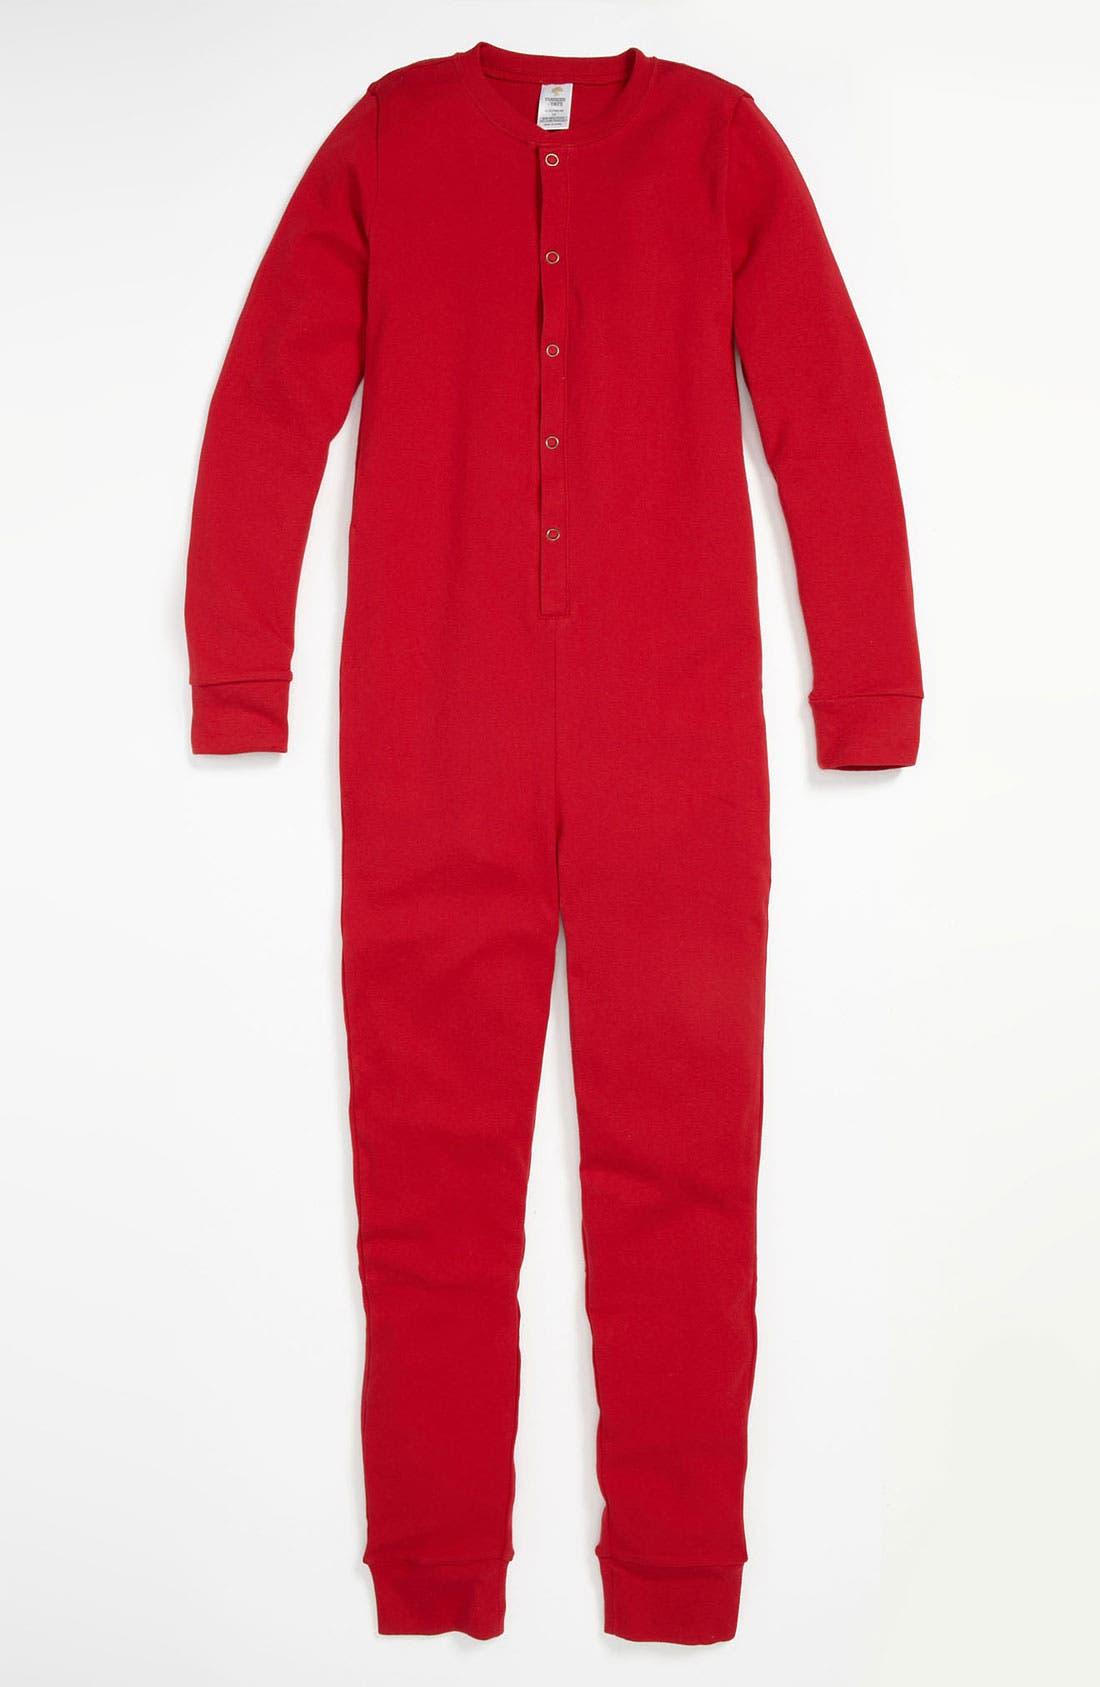 Main Image - Tucker + Tate 'Fireside' Fitted Pajamas (Little Boys & Big Boys)